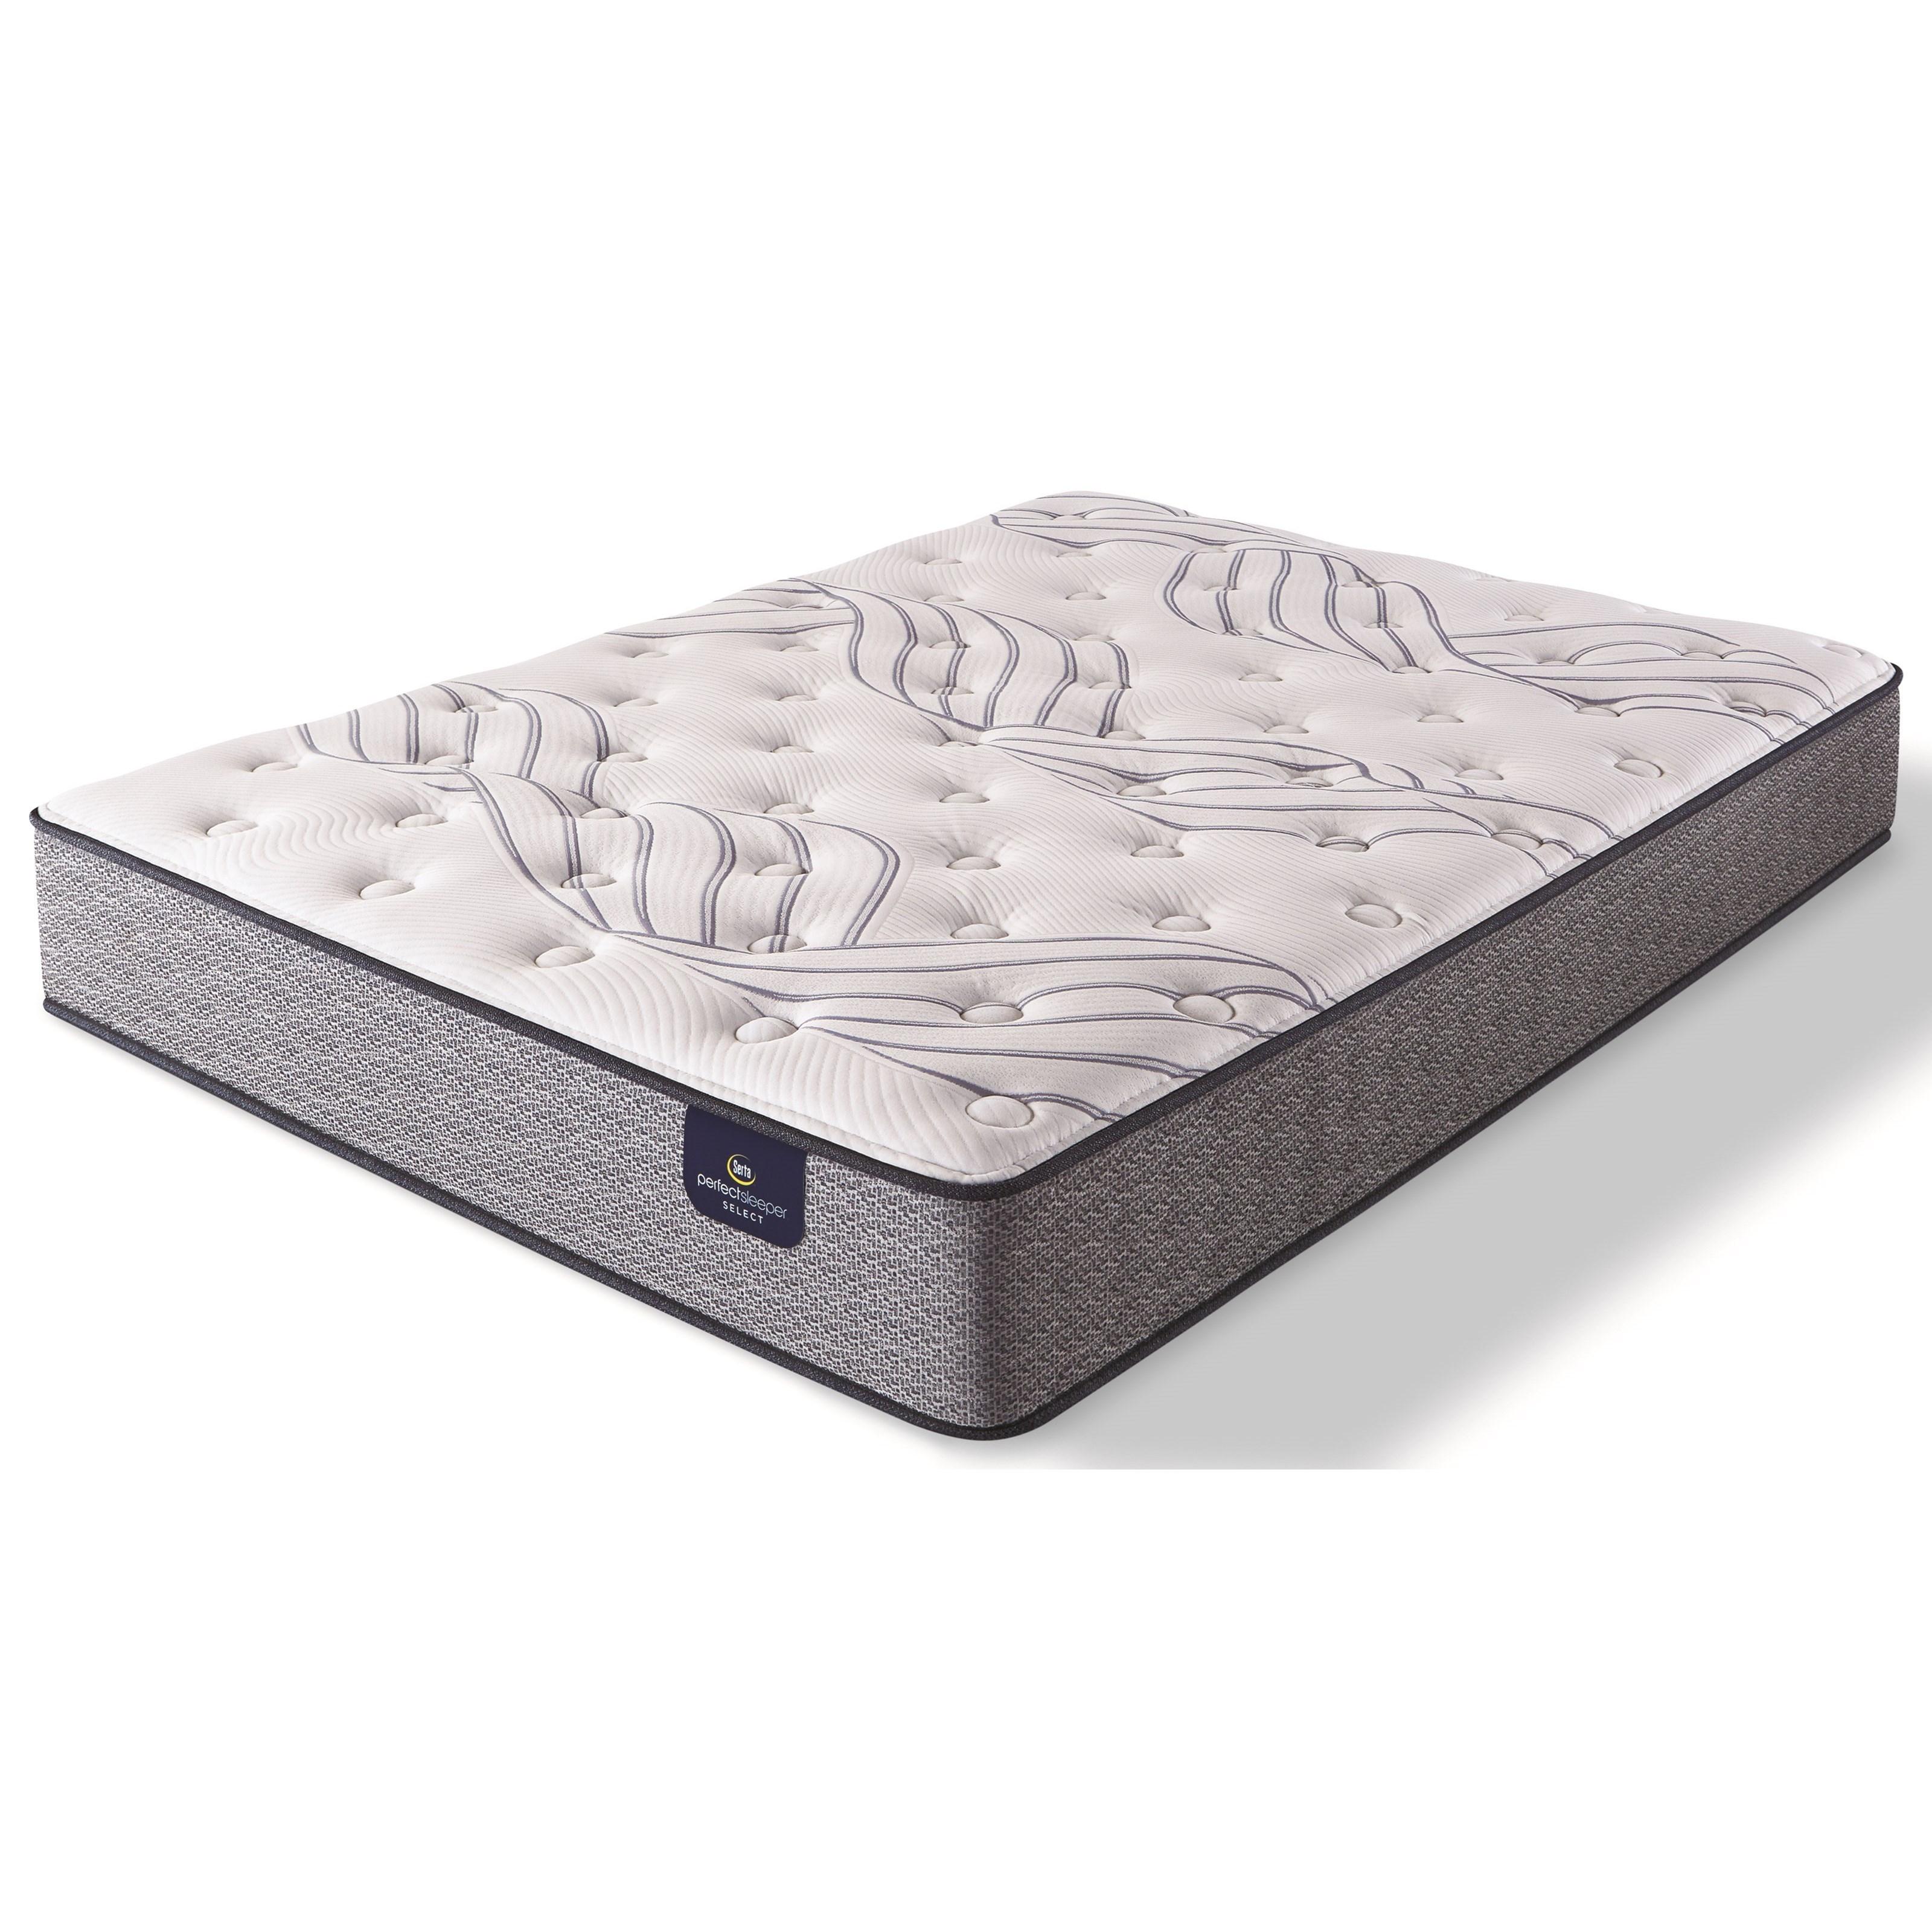 Kleinmon II Plush King Pocketed Coil Mattress by Serta at Darvin Furniture